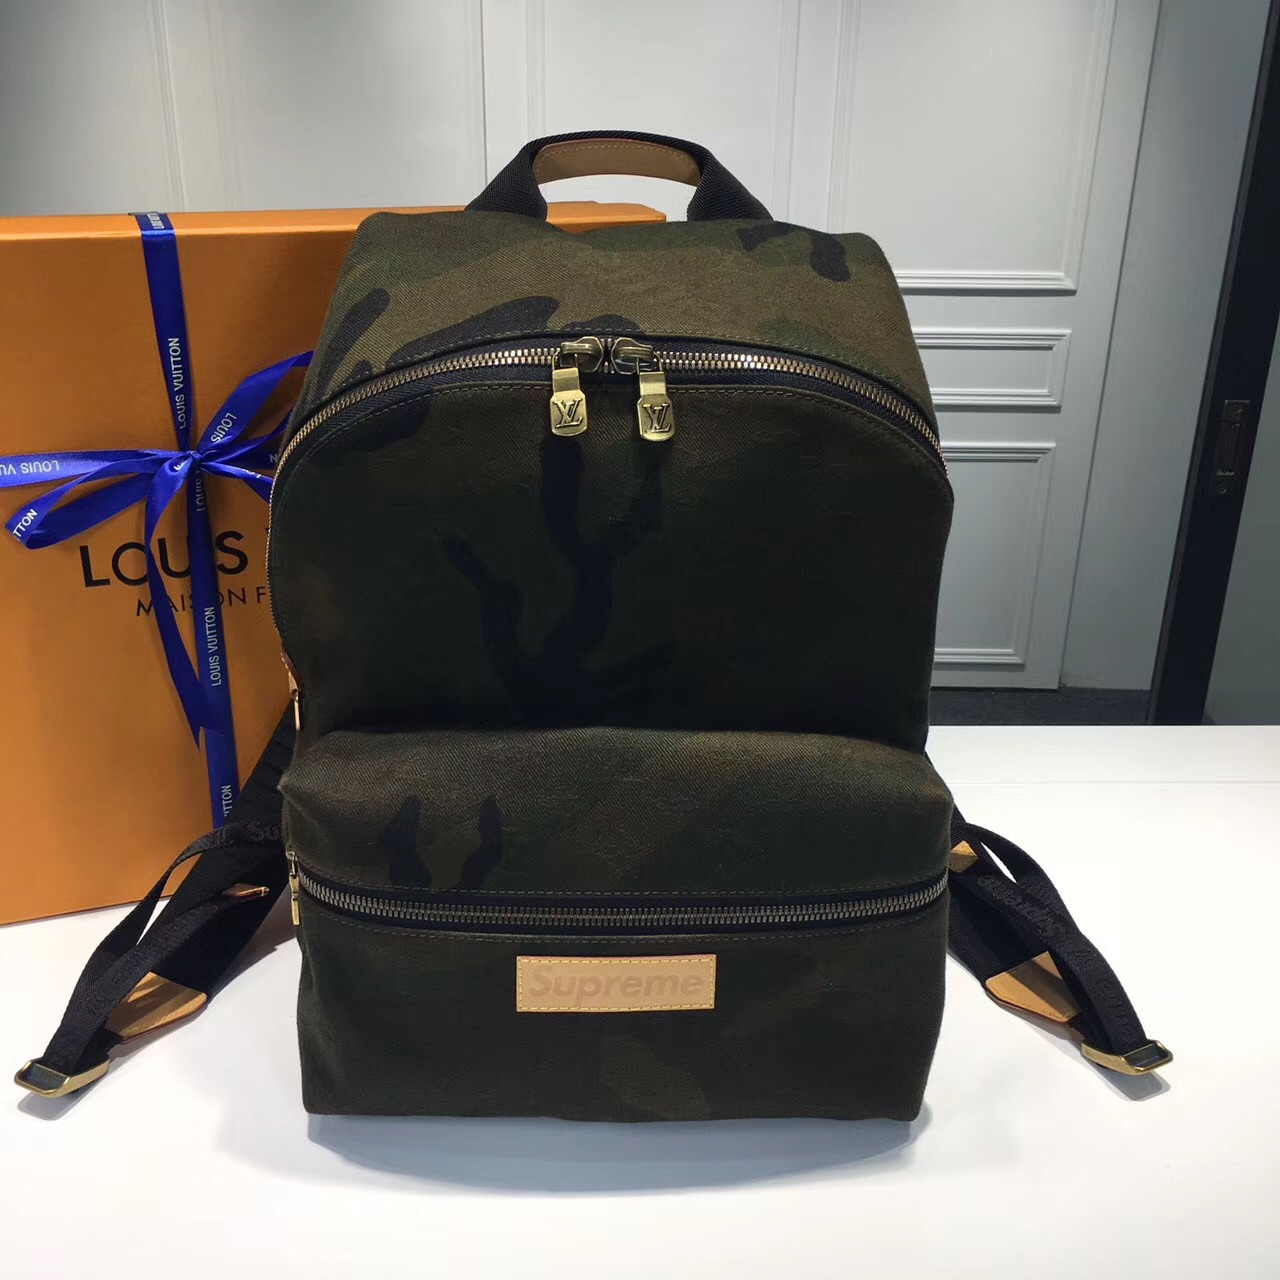 27116614d137 Рюкзак Louis Vuitton X Supreme городской камуфляж, цена 9 800 грн ...